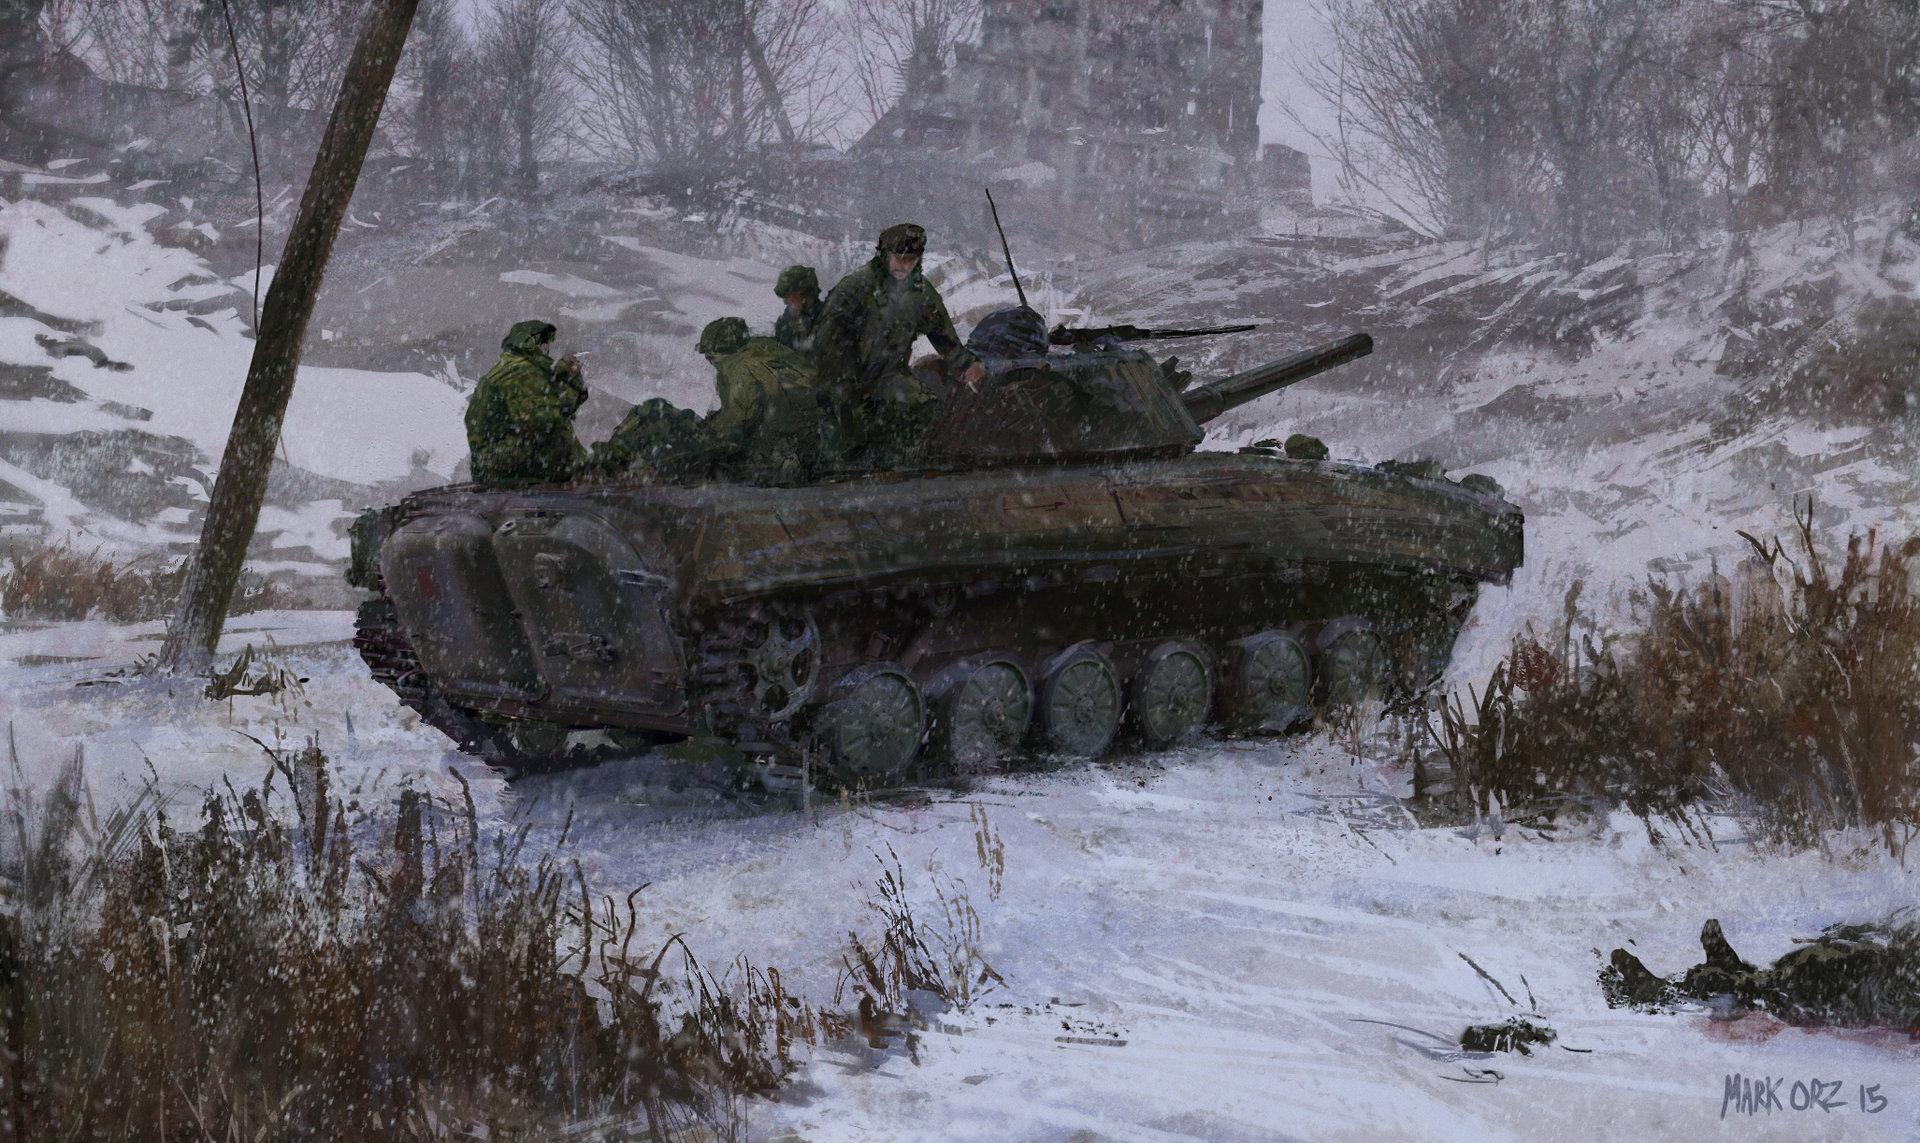 Mark orzechowski markorz snowtank big